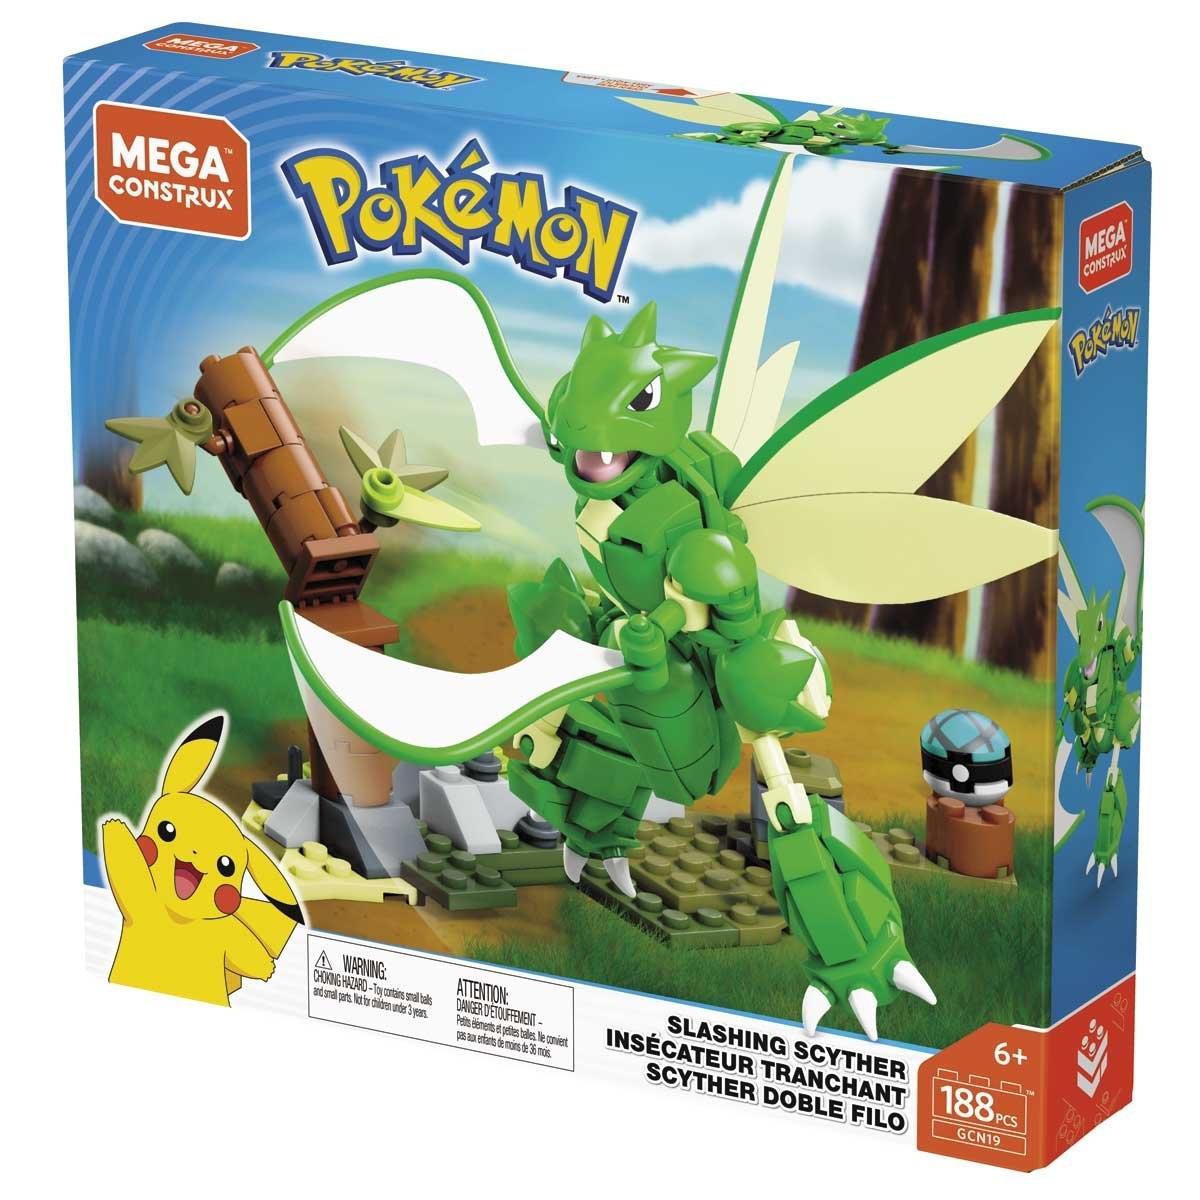 Sears: Mega Construx Pokemon Scyther Doble Filo Mattel